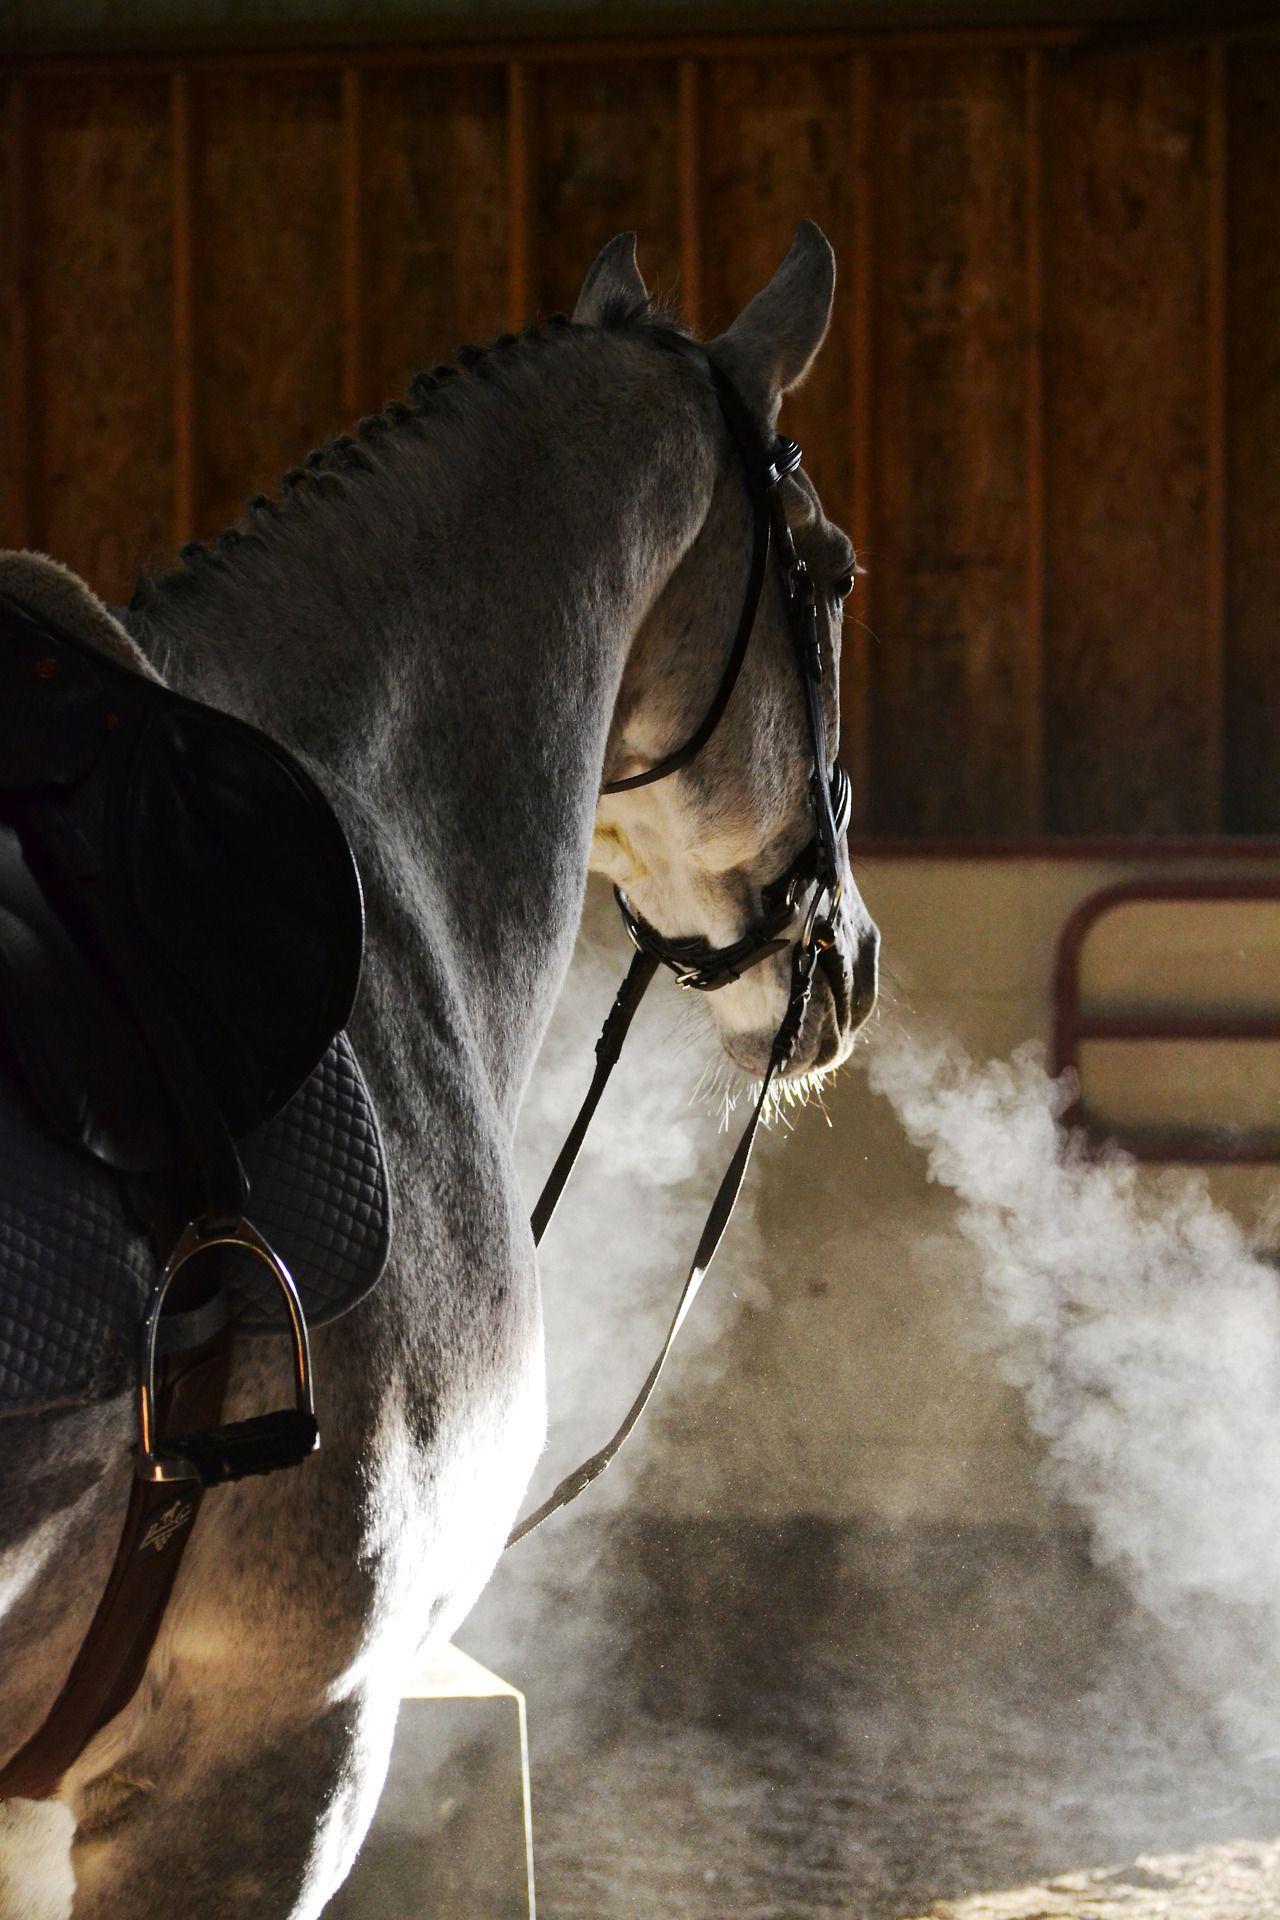 Dapple Grey Paintourstars October 2017 Carolyn Photographie Equestre Photos De Chevaux Image Cheval